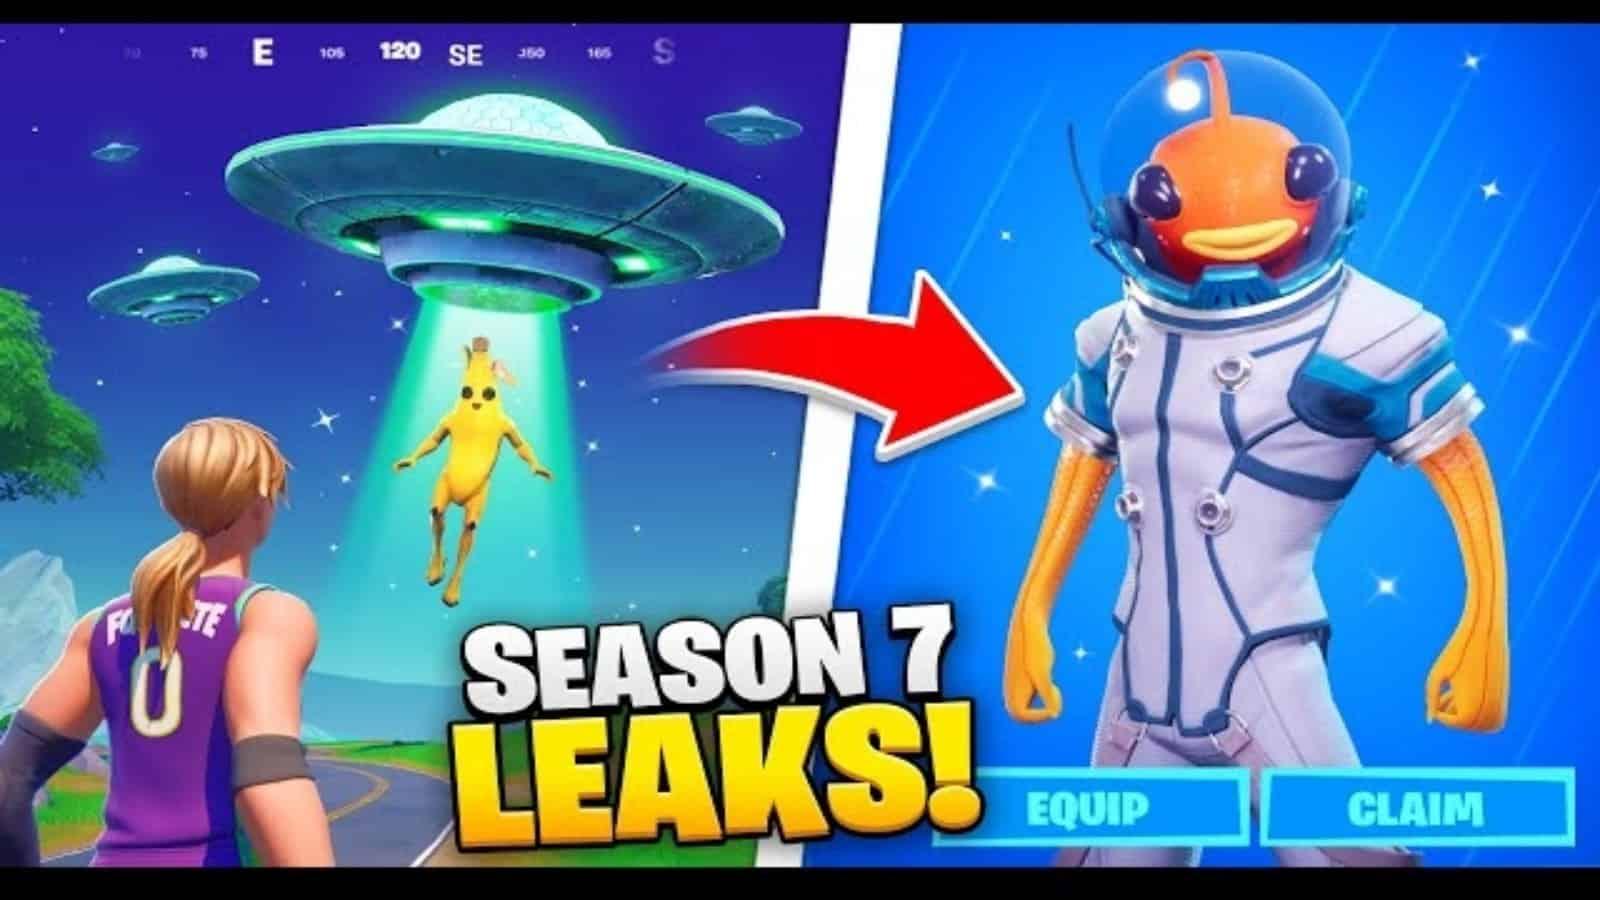 Fortnite Season 7 Leaks